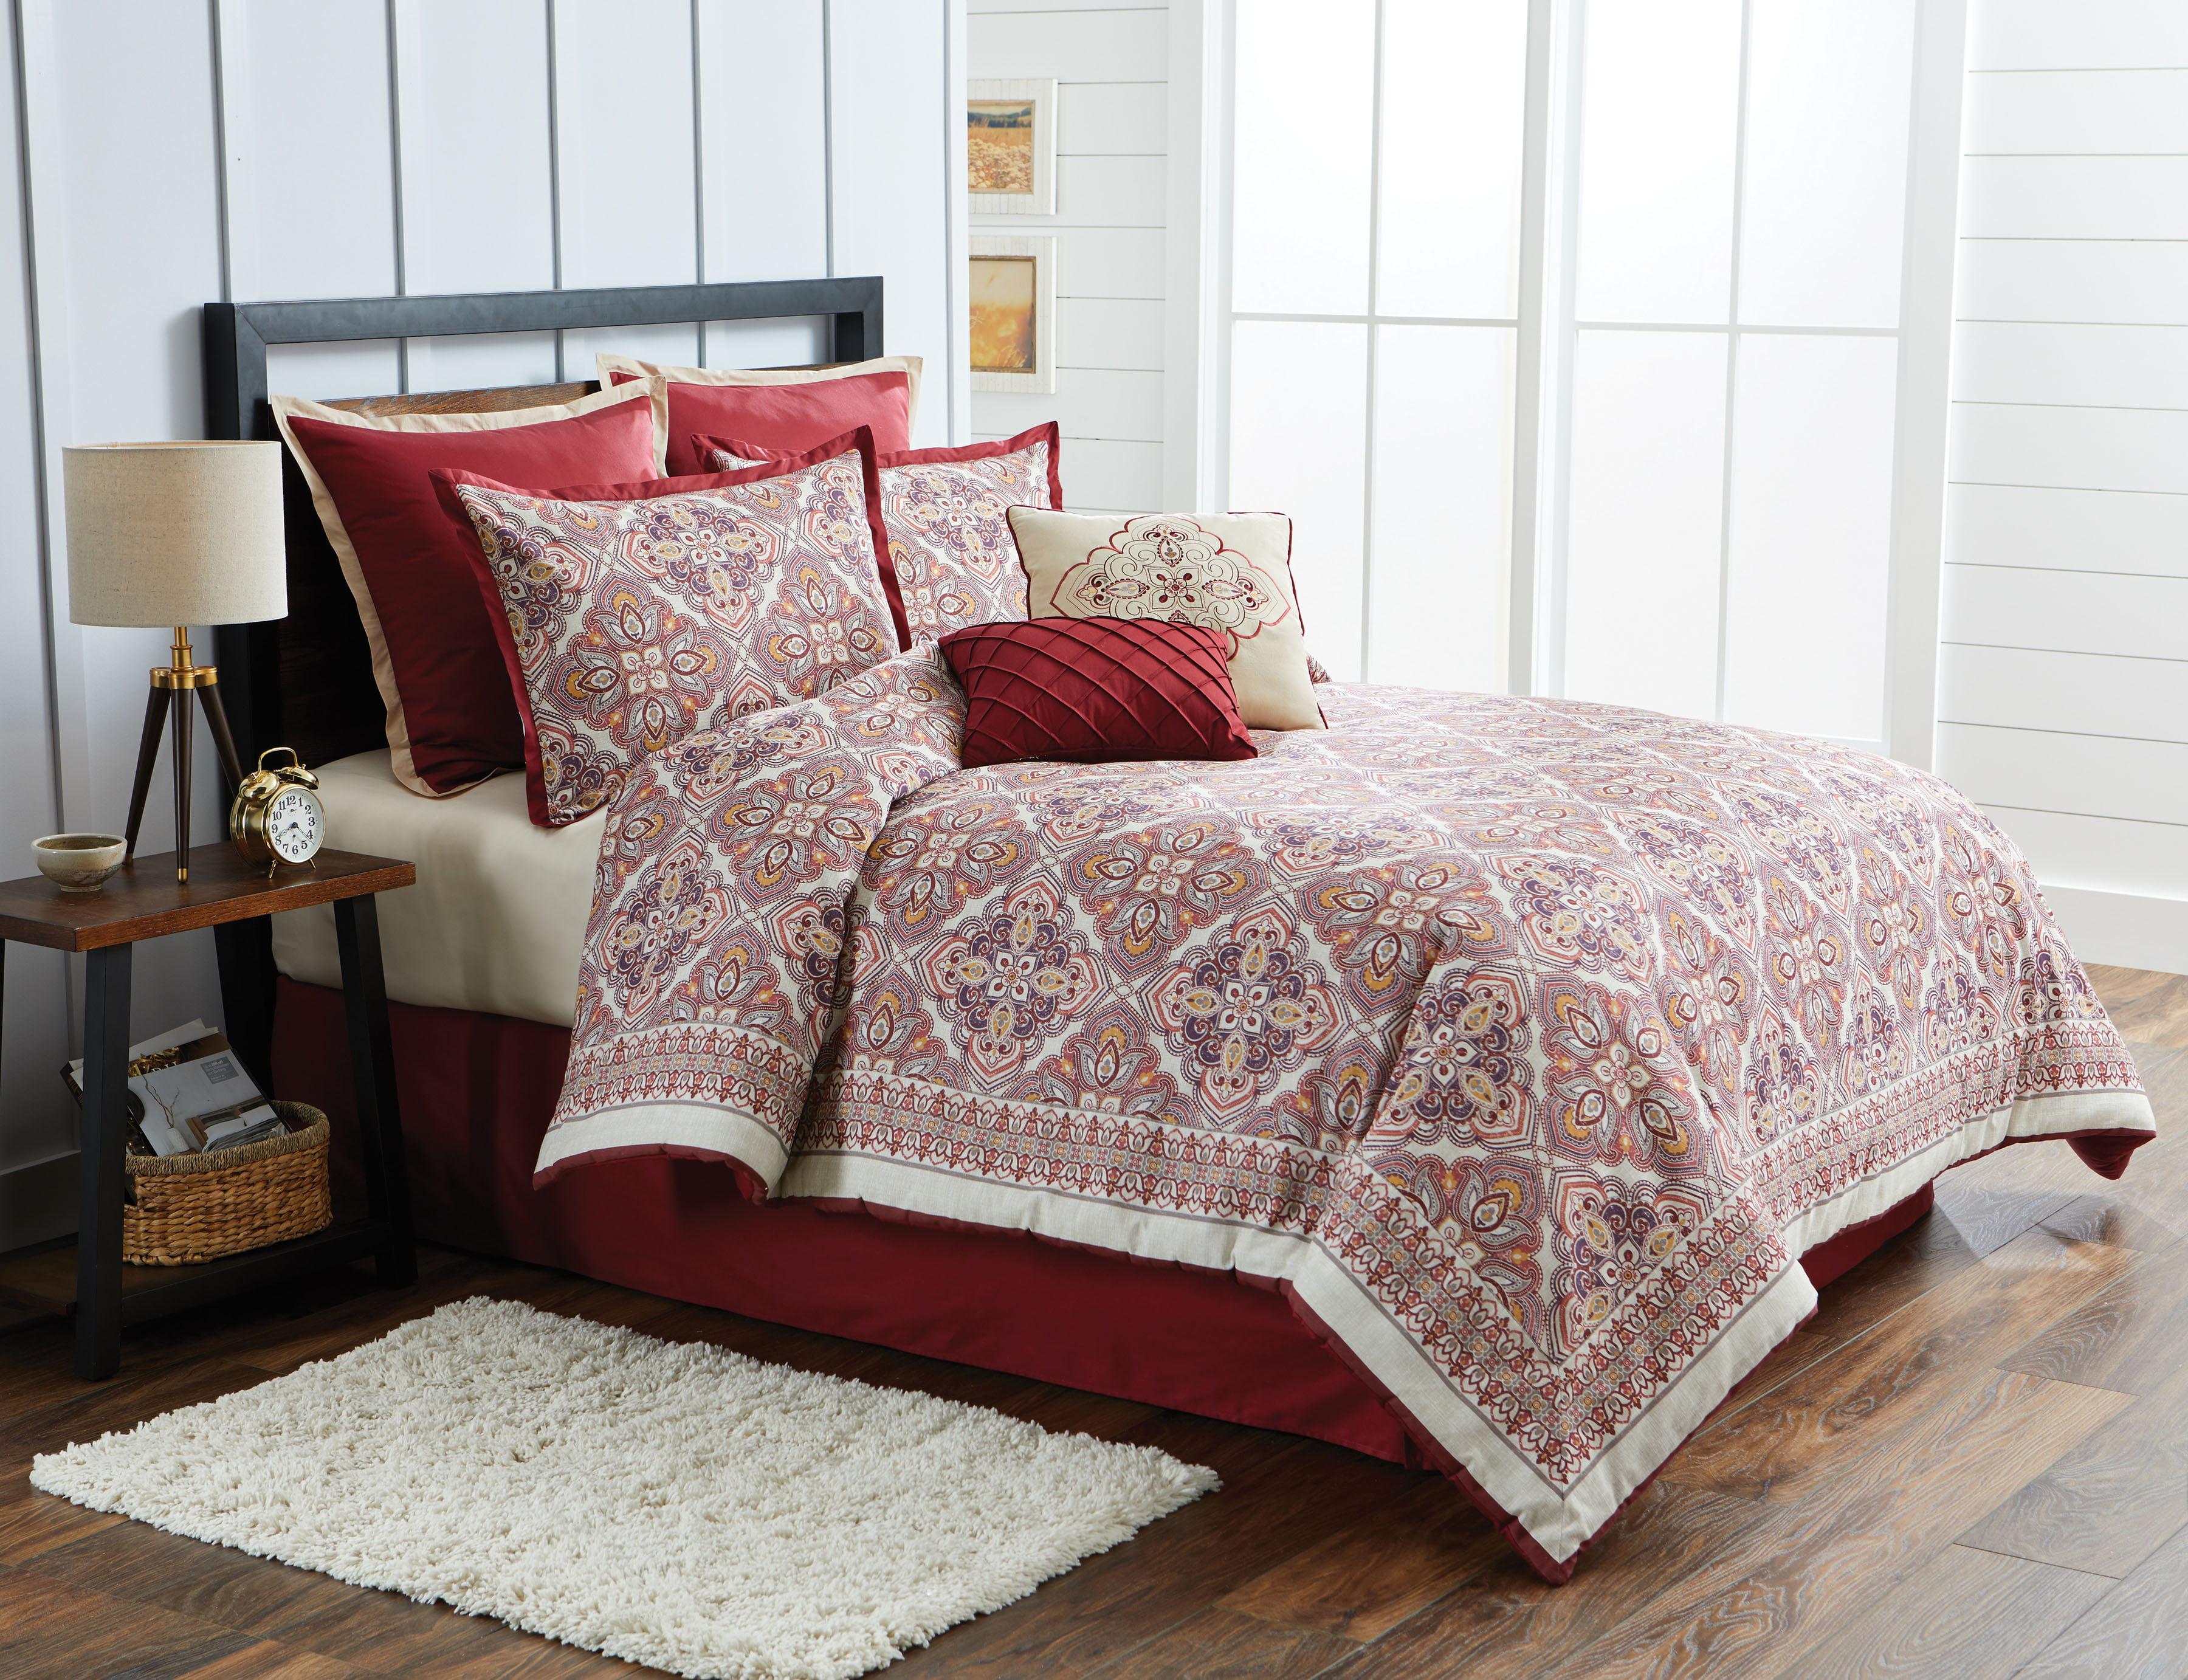 Better Homes & Gardens King Global Mandala Comforter Set, 8 Piece